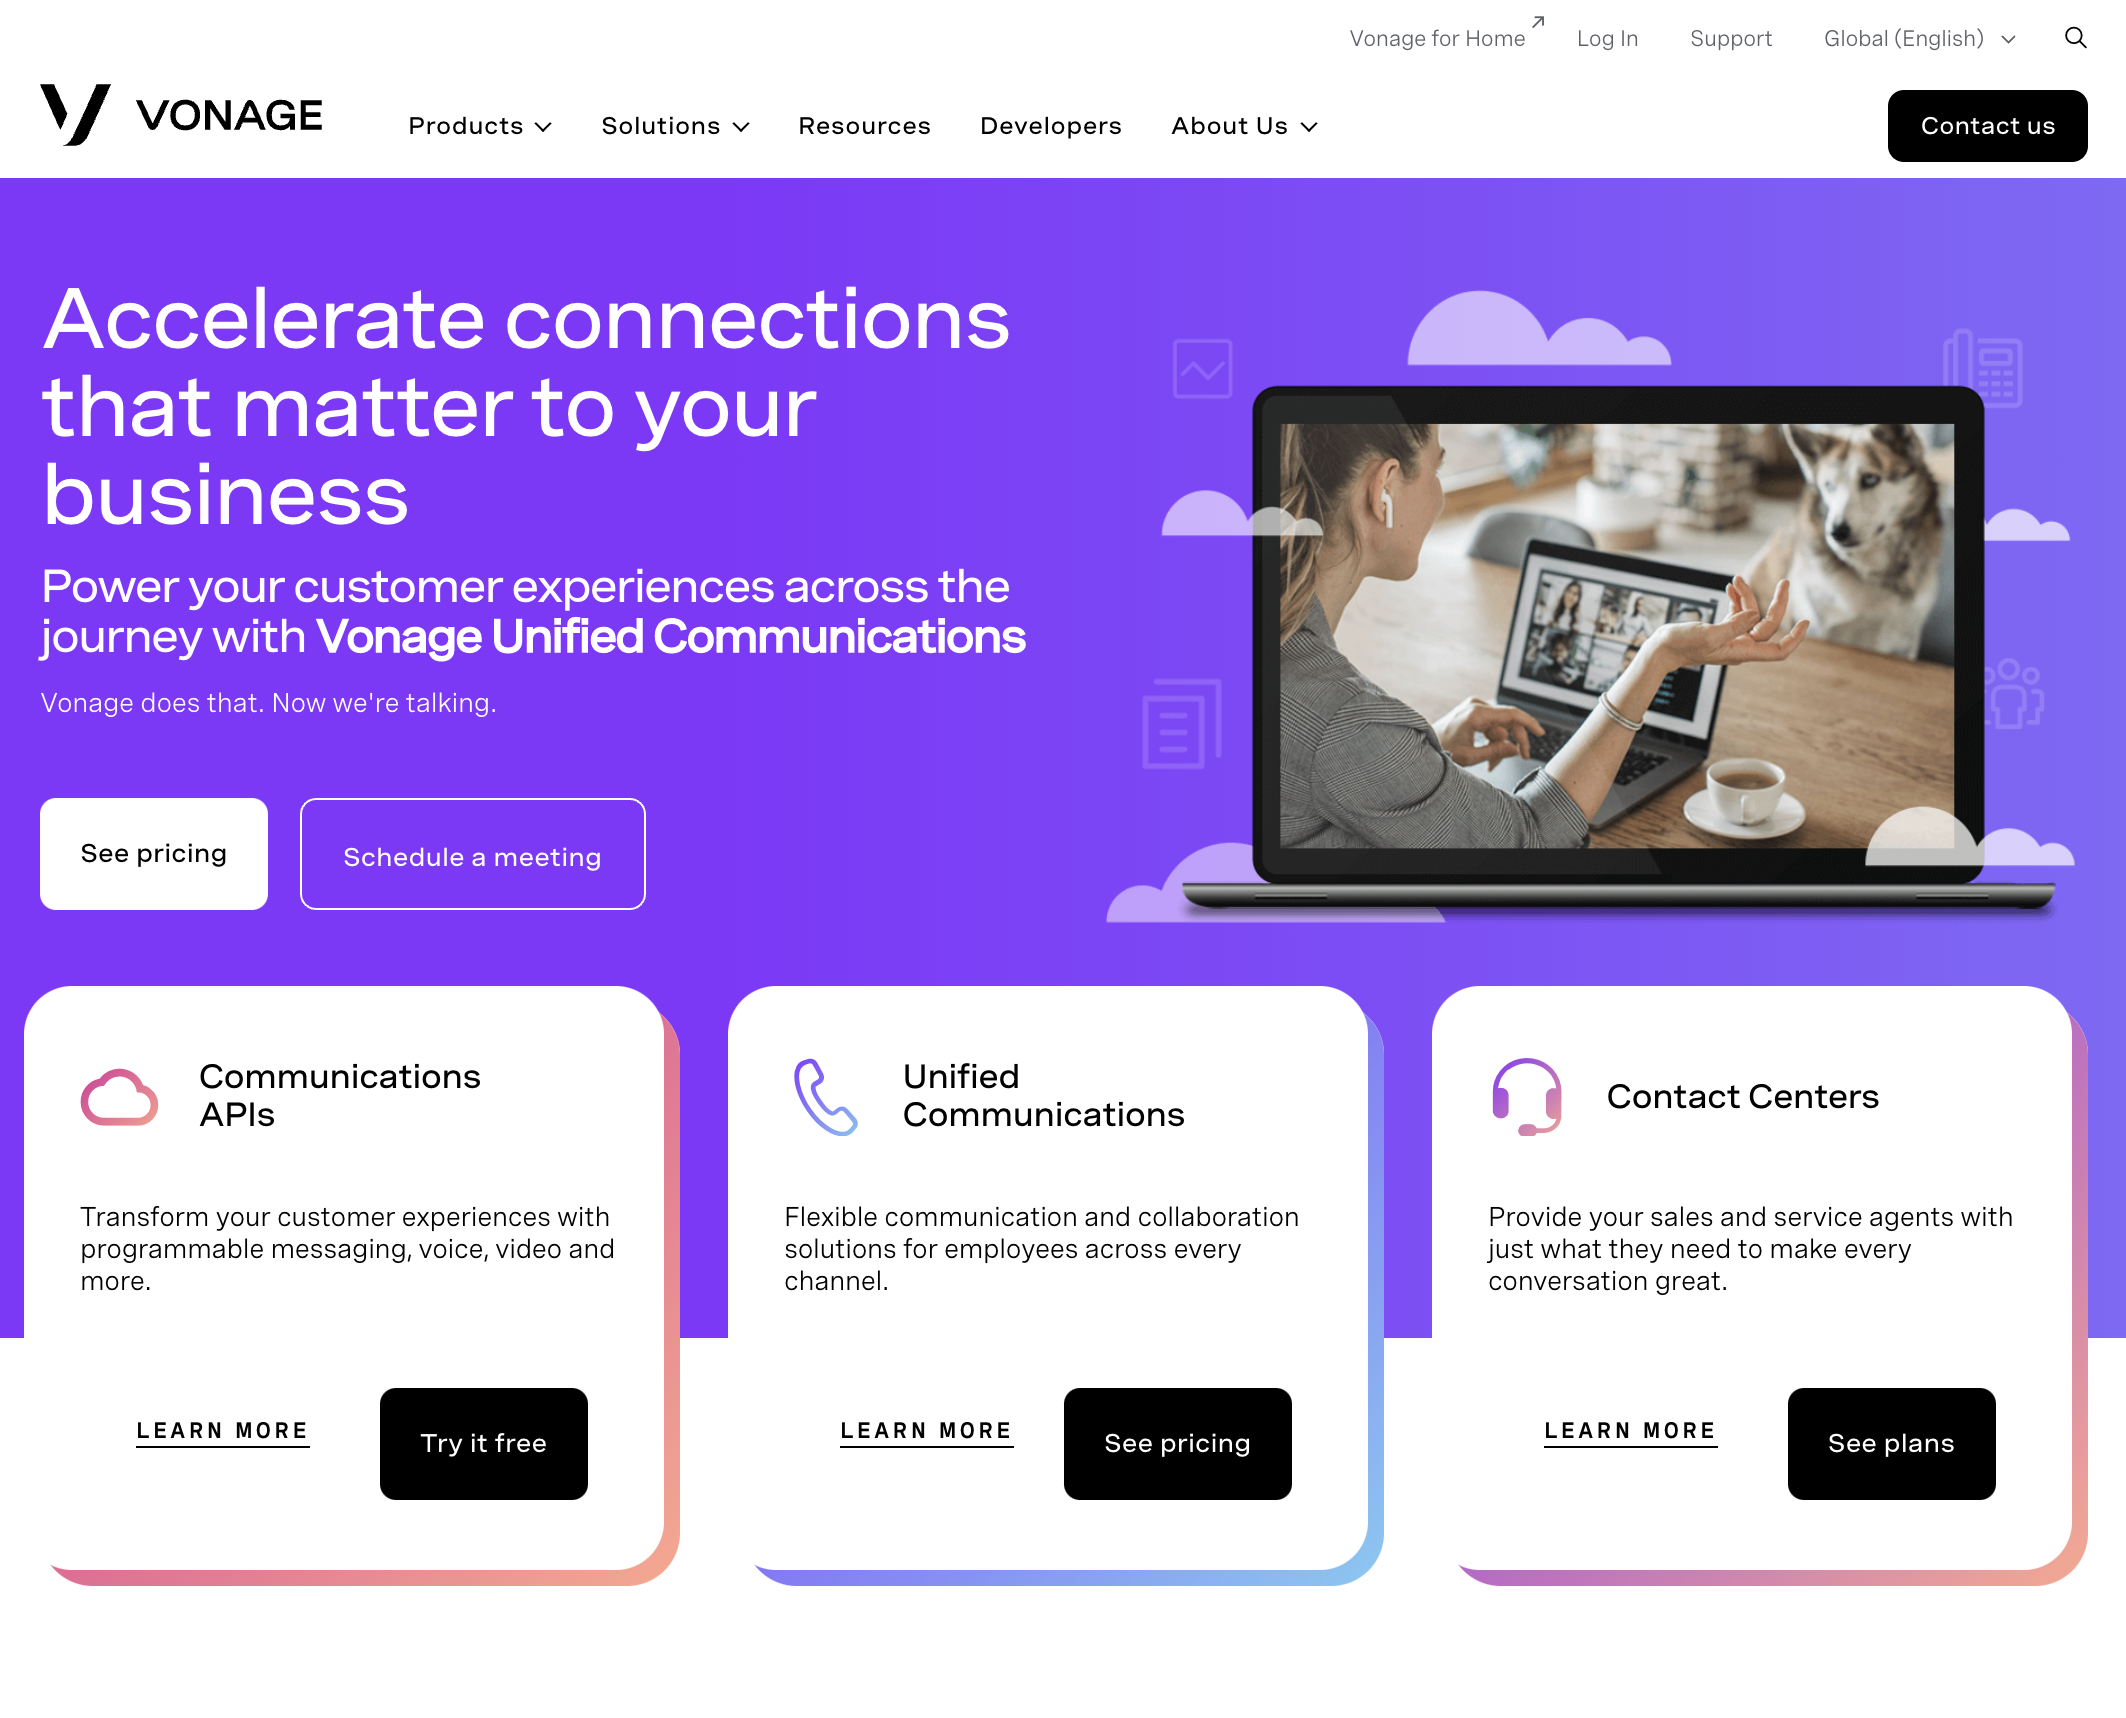 Vonage.com Homepage Screenshot